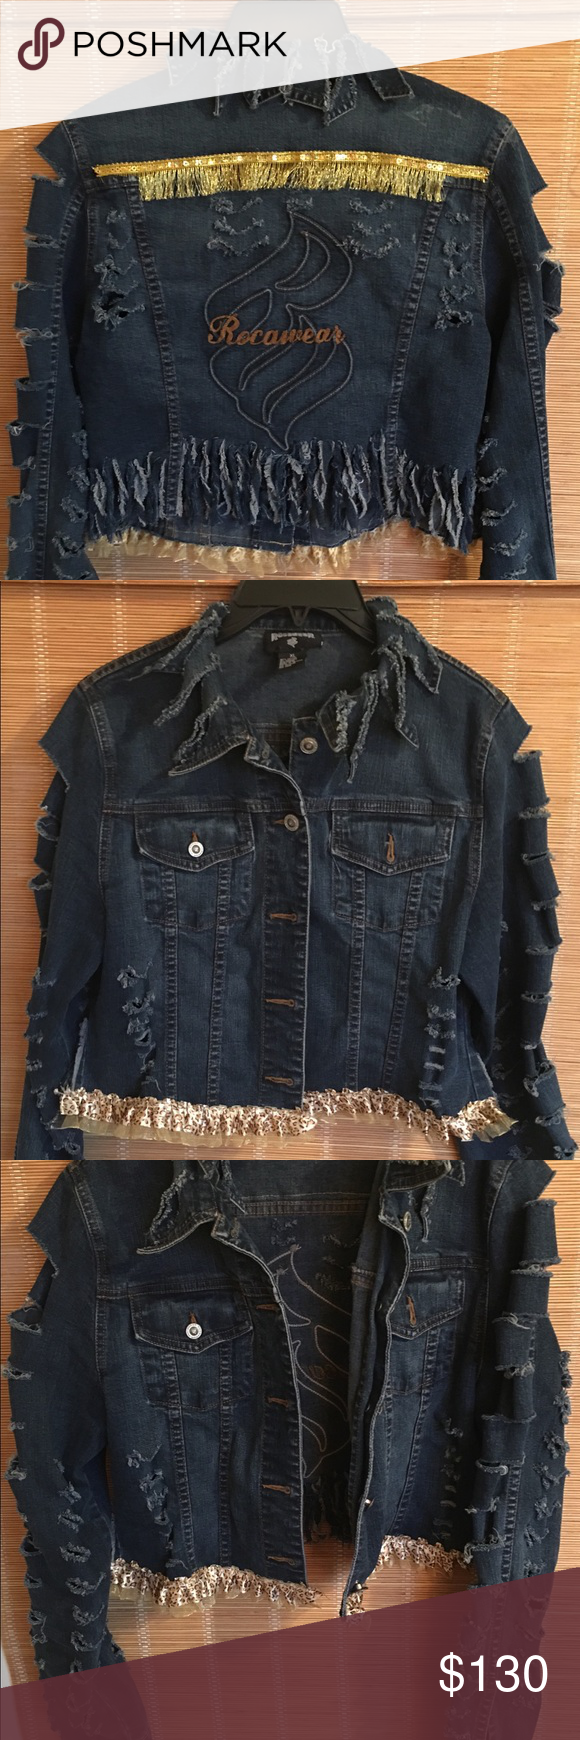 Tear It Up Jacket Jackets Jackets For Women Fringe Jacket [ 1740 x 580 Pixel ]